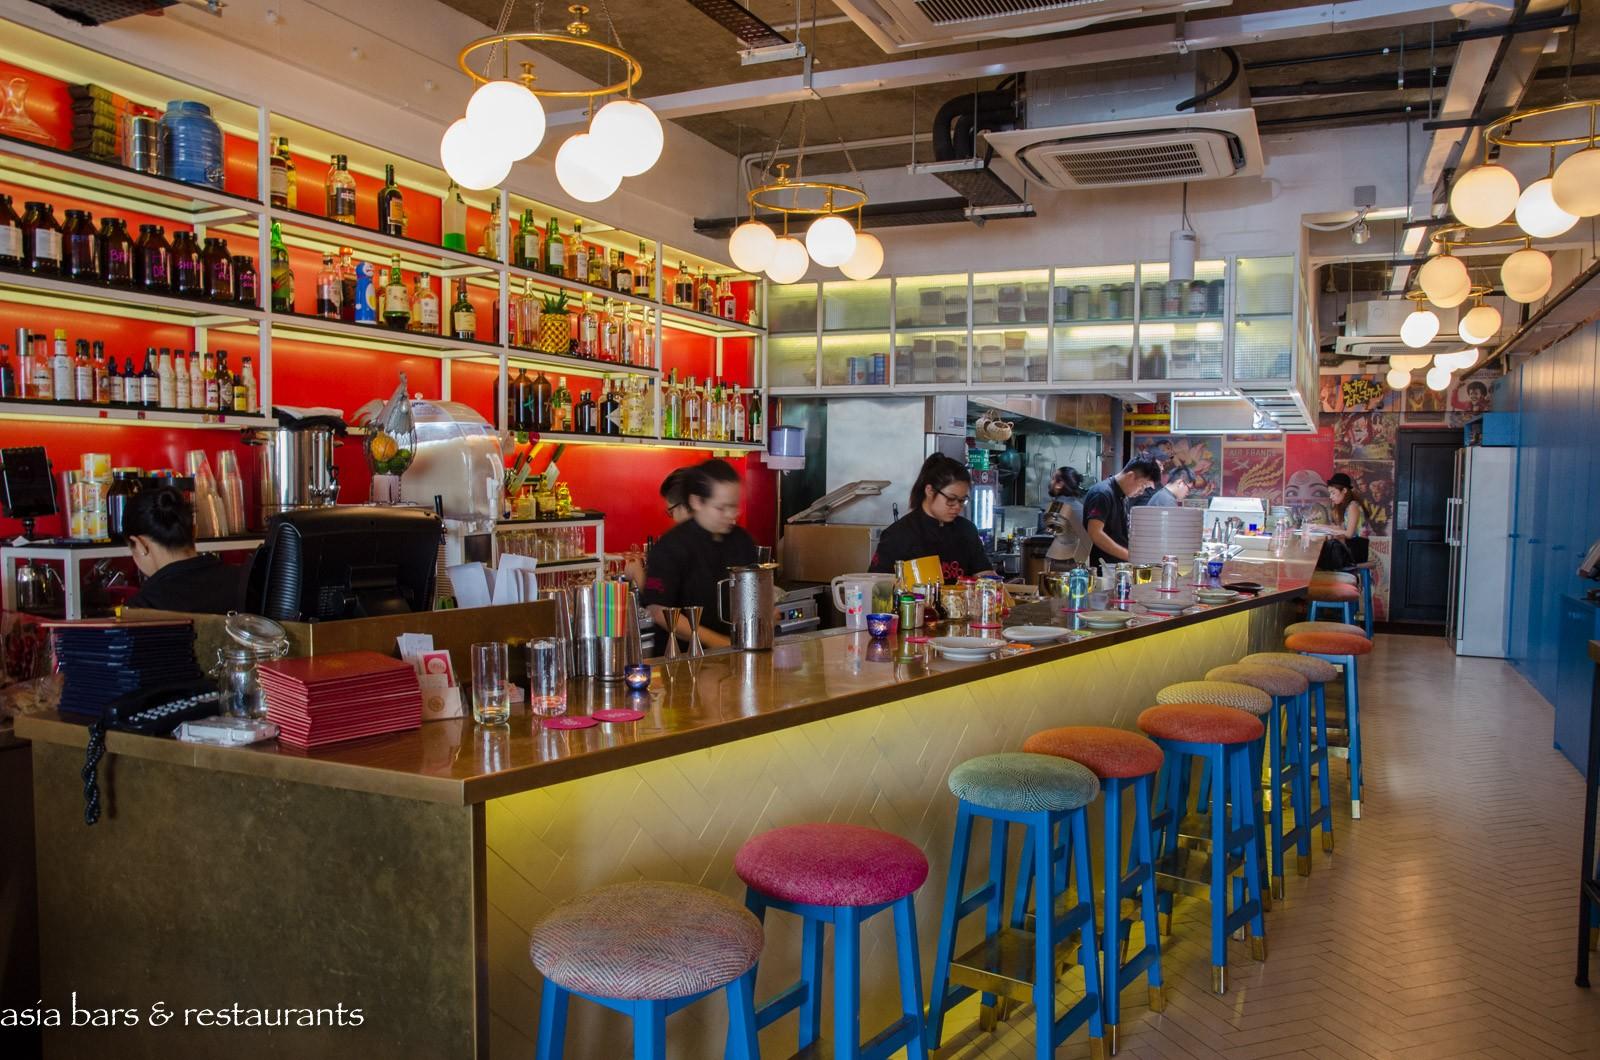 Ding Dong - Southeast Asian cuisines restaurant & bar in ...